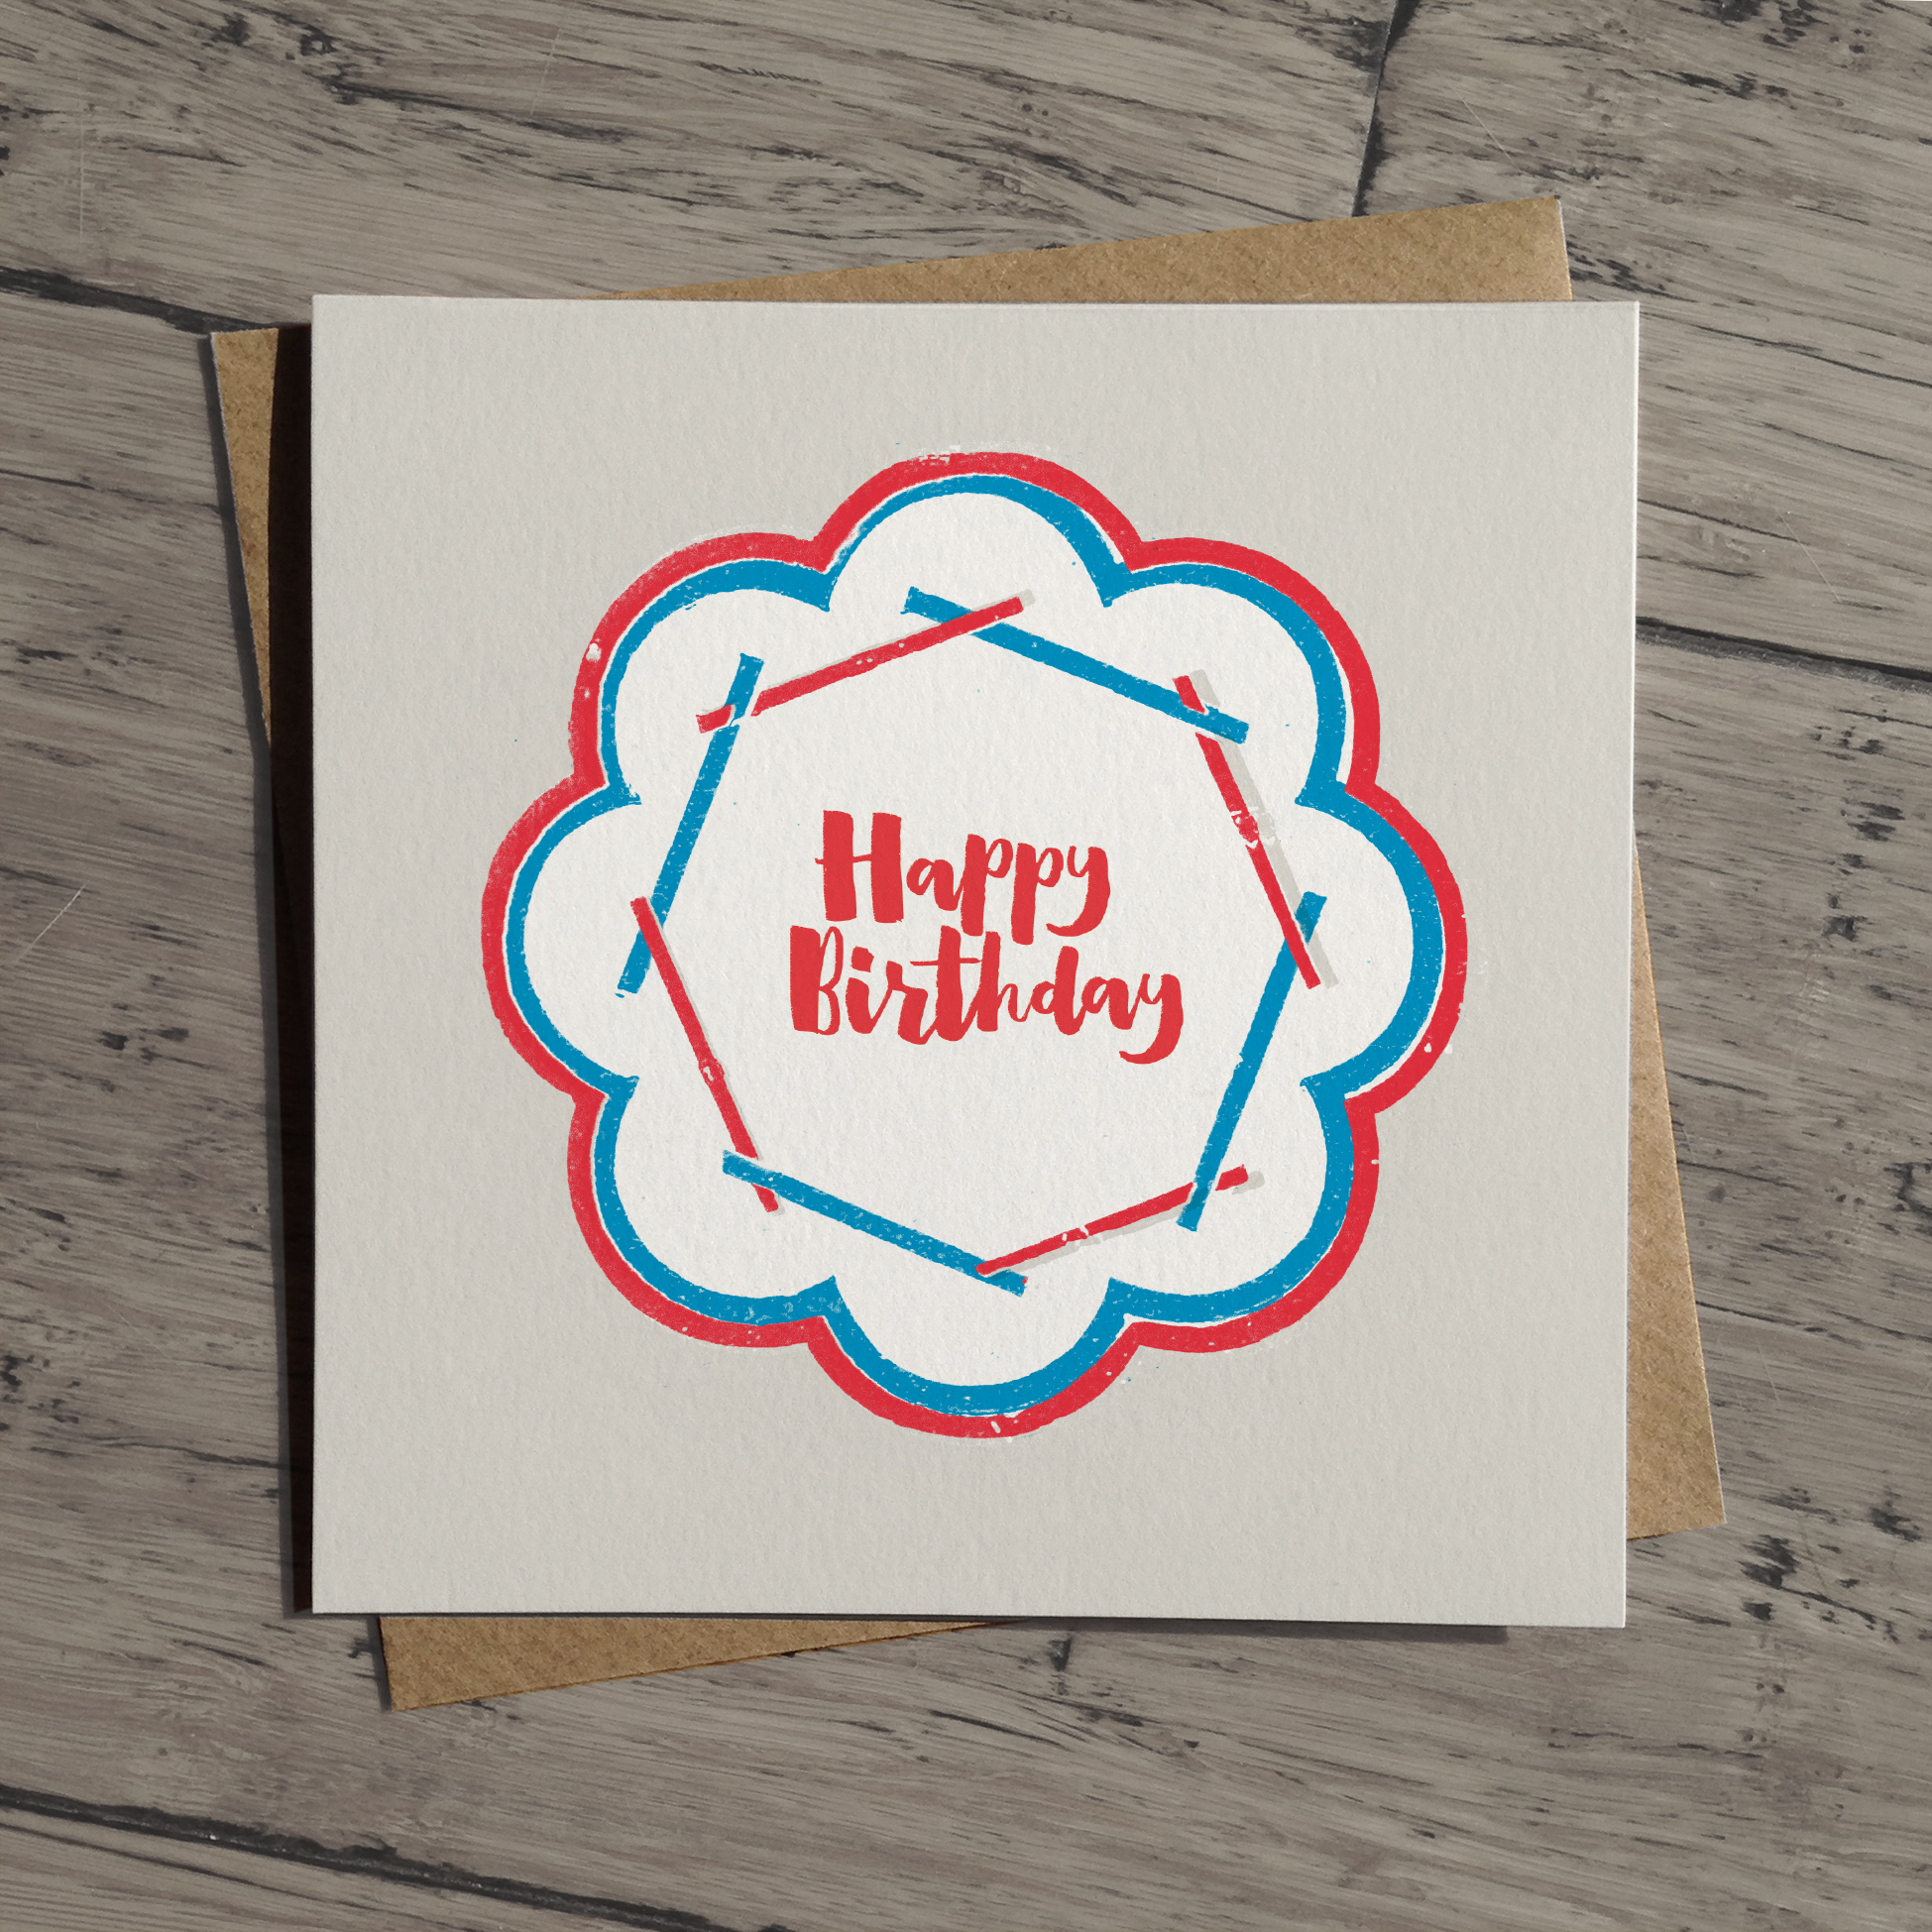 Happy Birthday card: WW03_HB